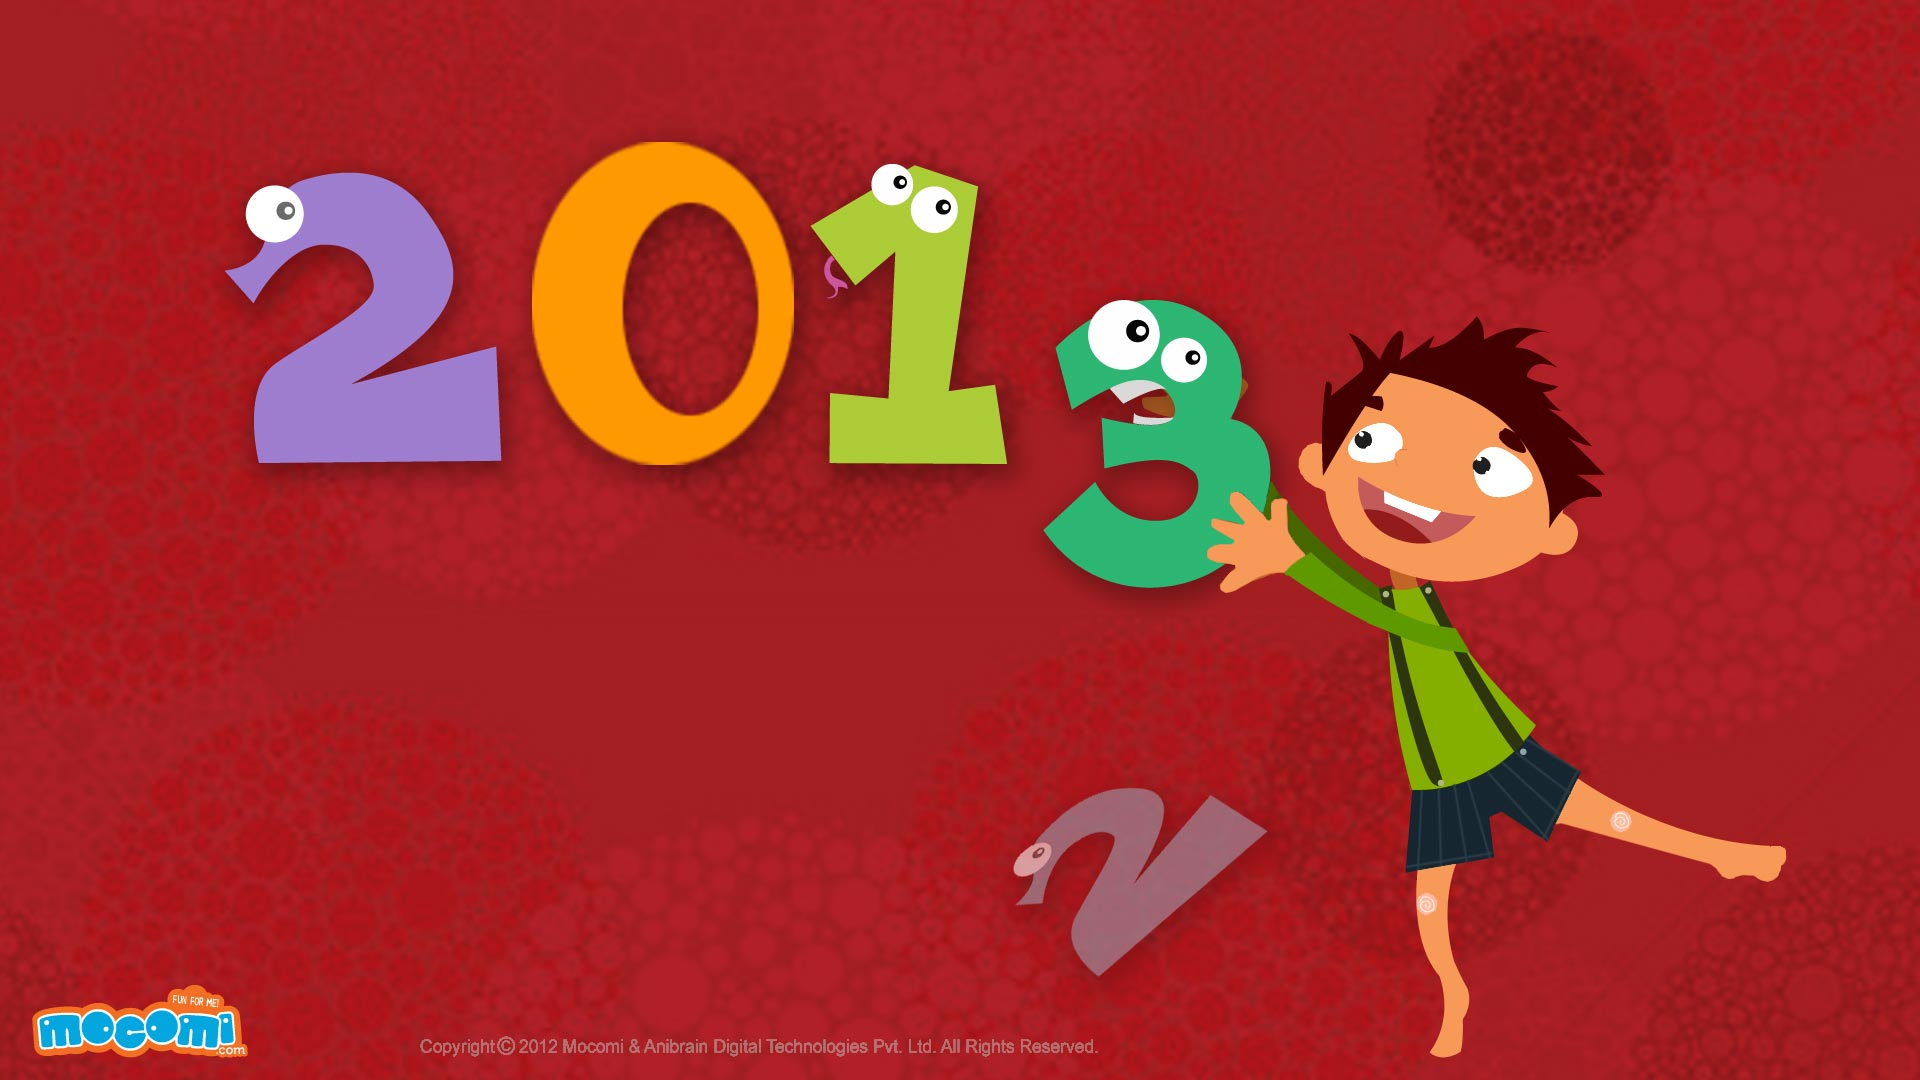 Happy New Year 2013 – 04